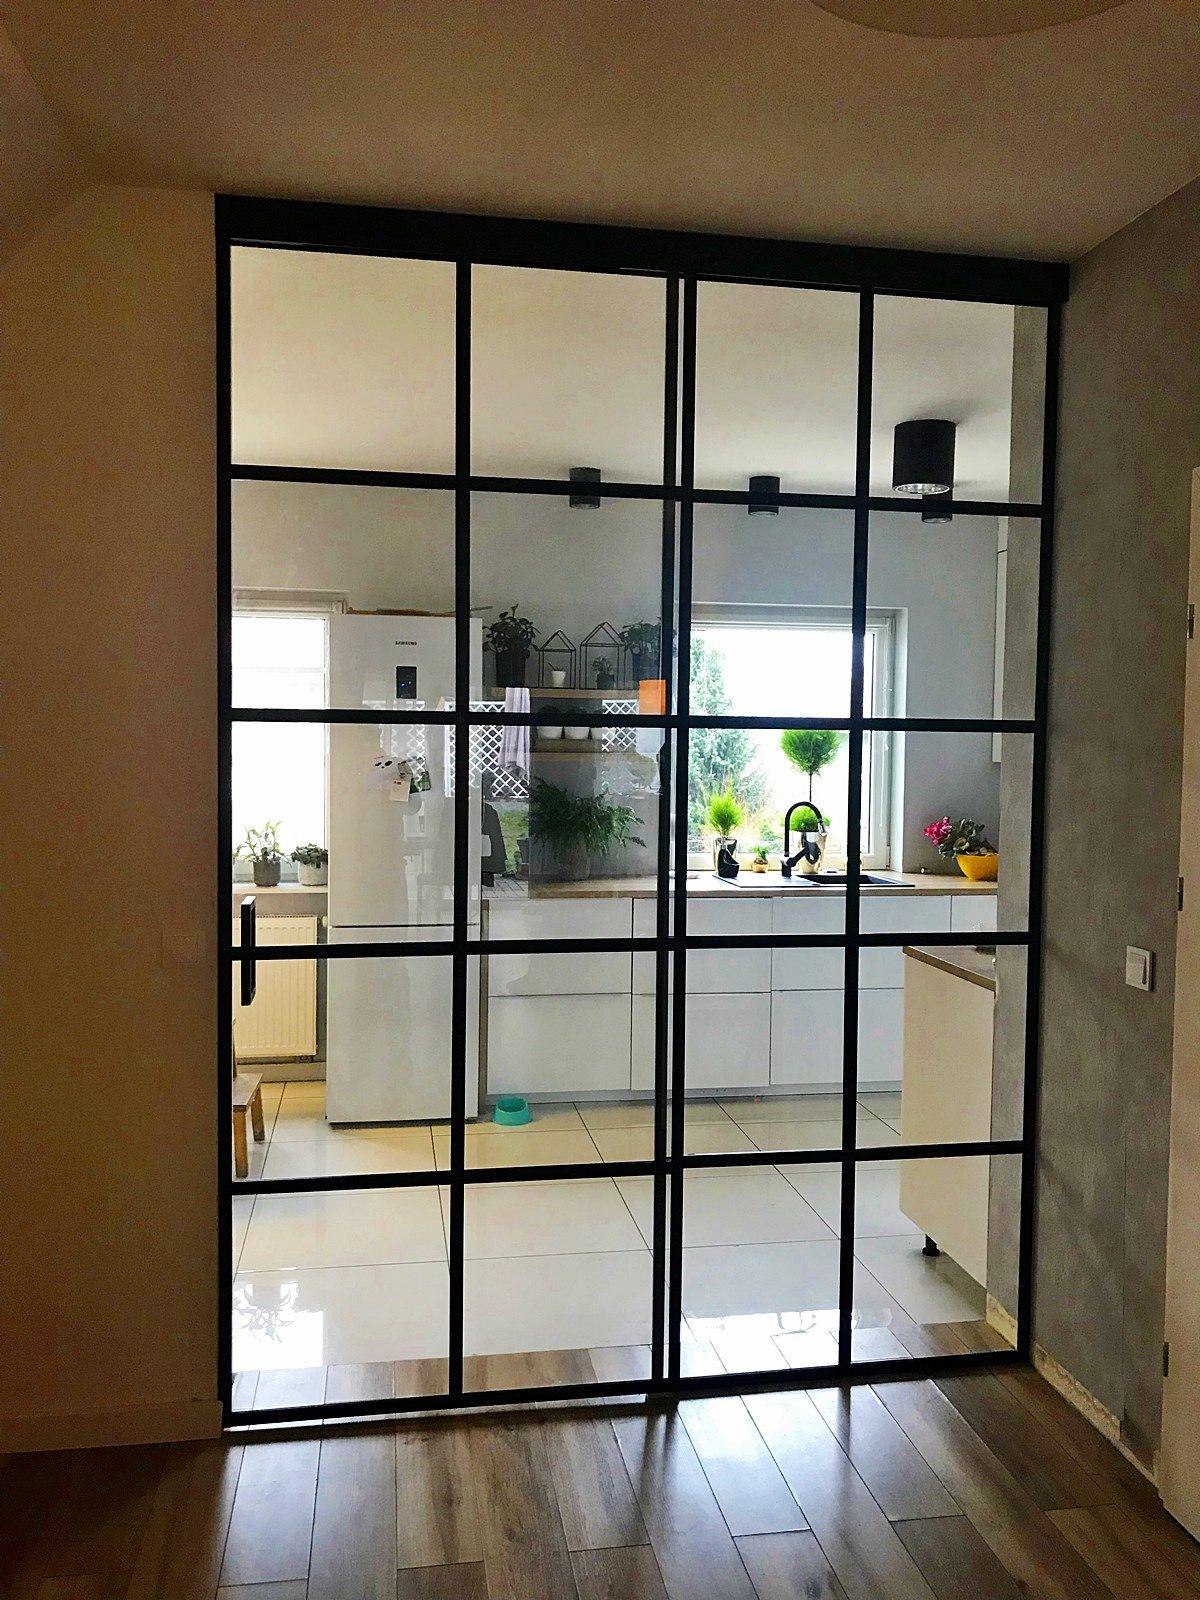 Drzwi Loftowe Przesuwne Producent Kamadoor Interior Design Trends Interior Design Living Room Interior